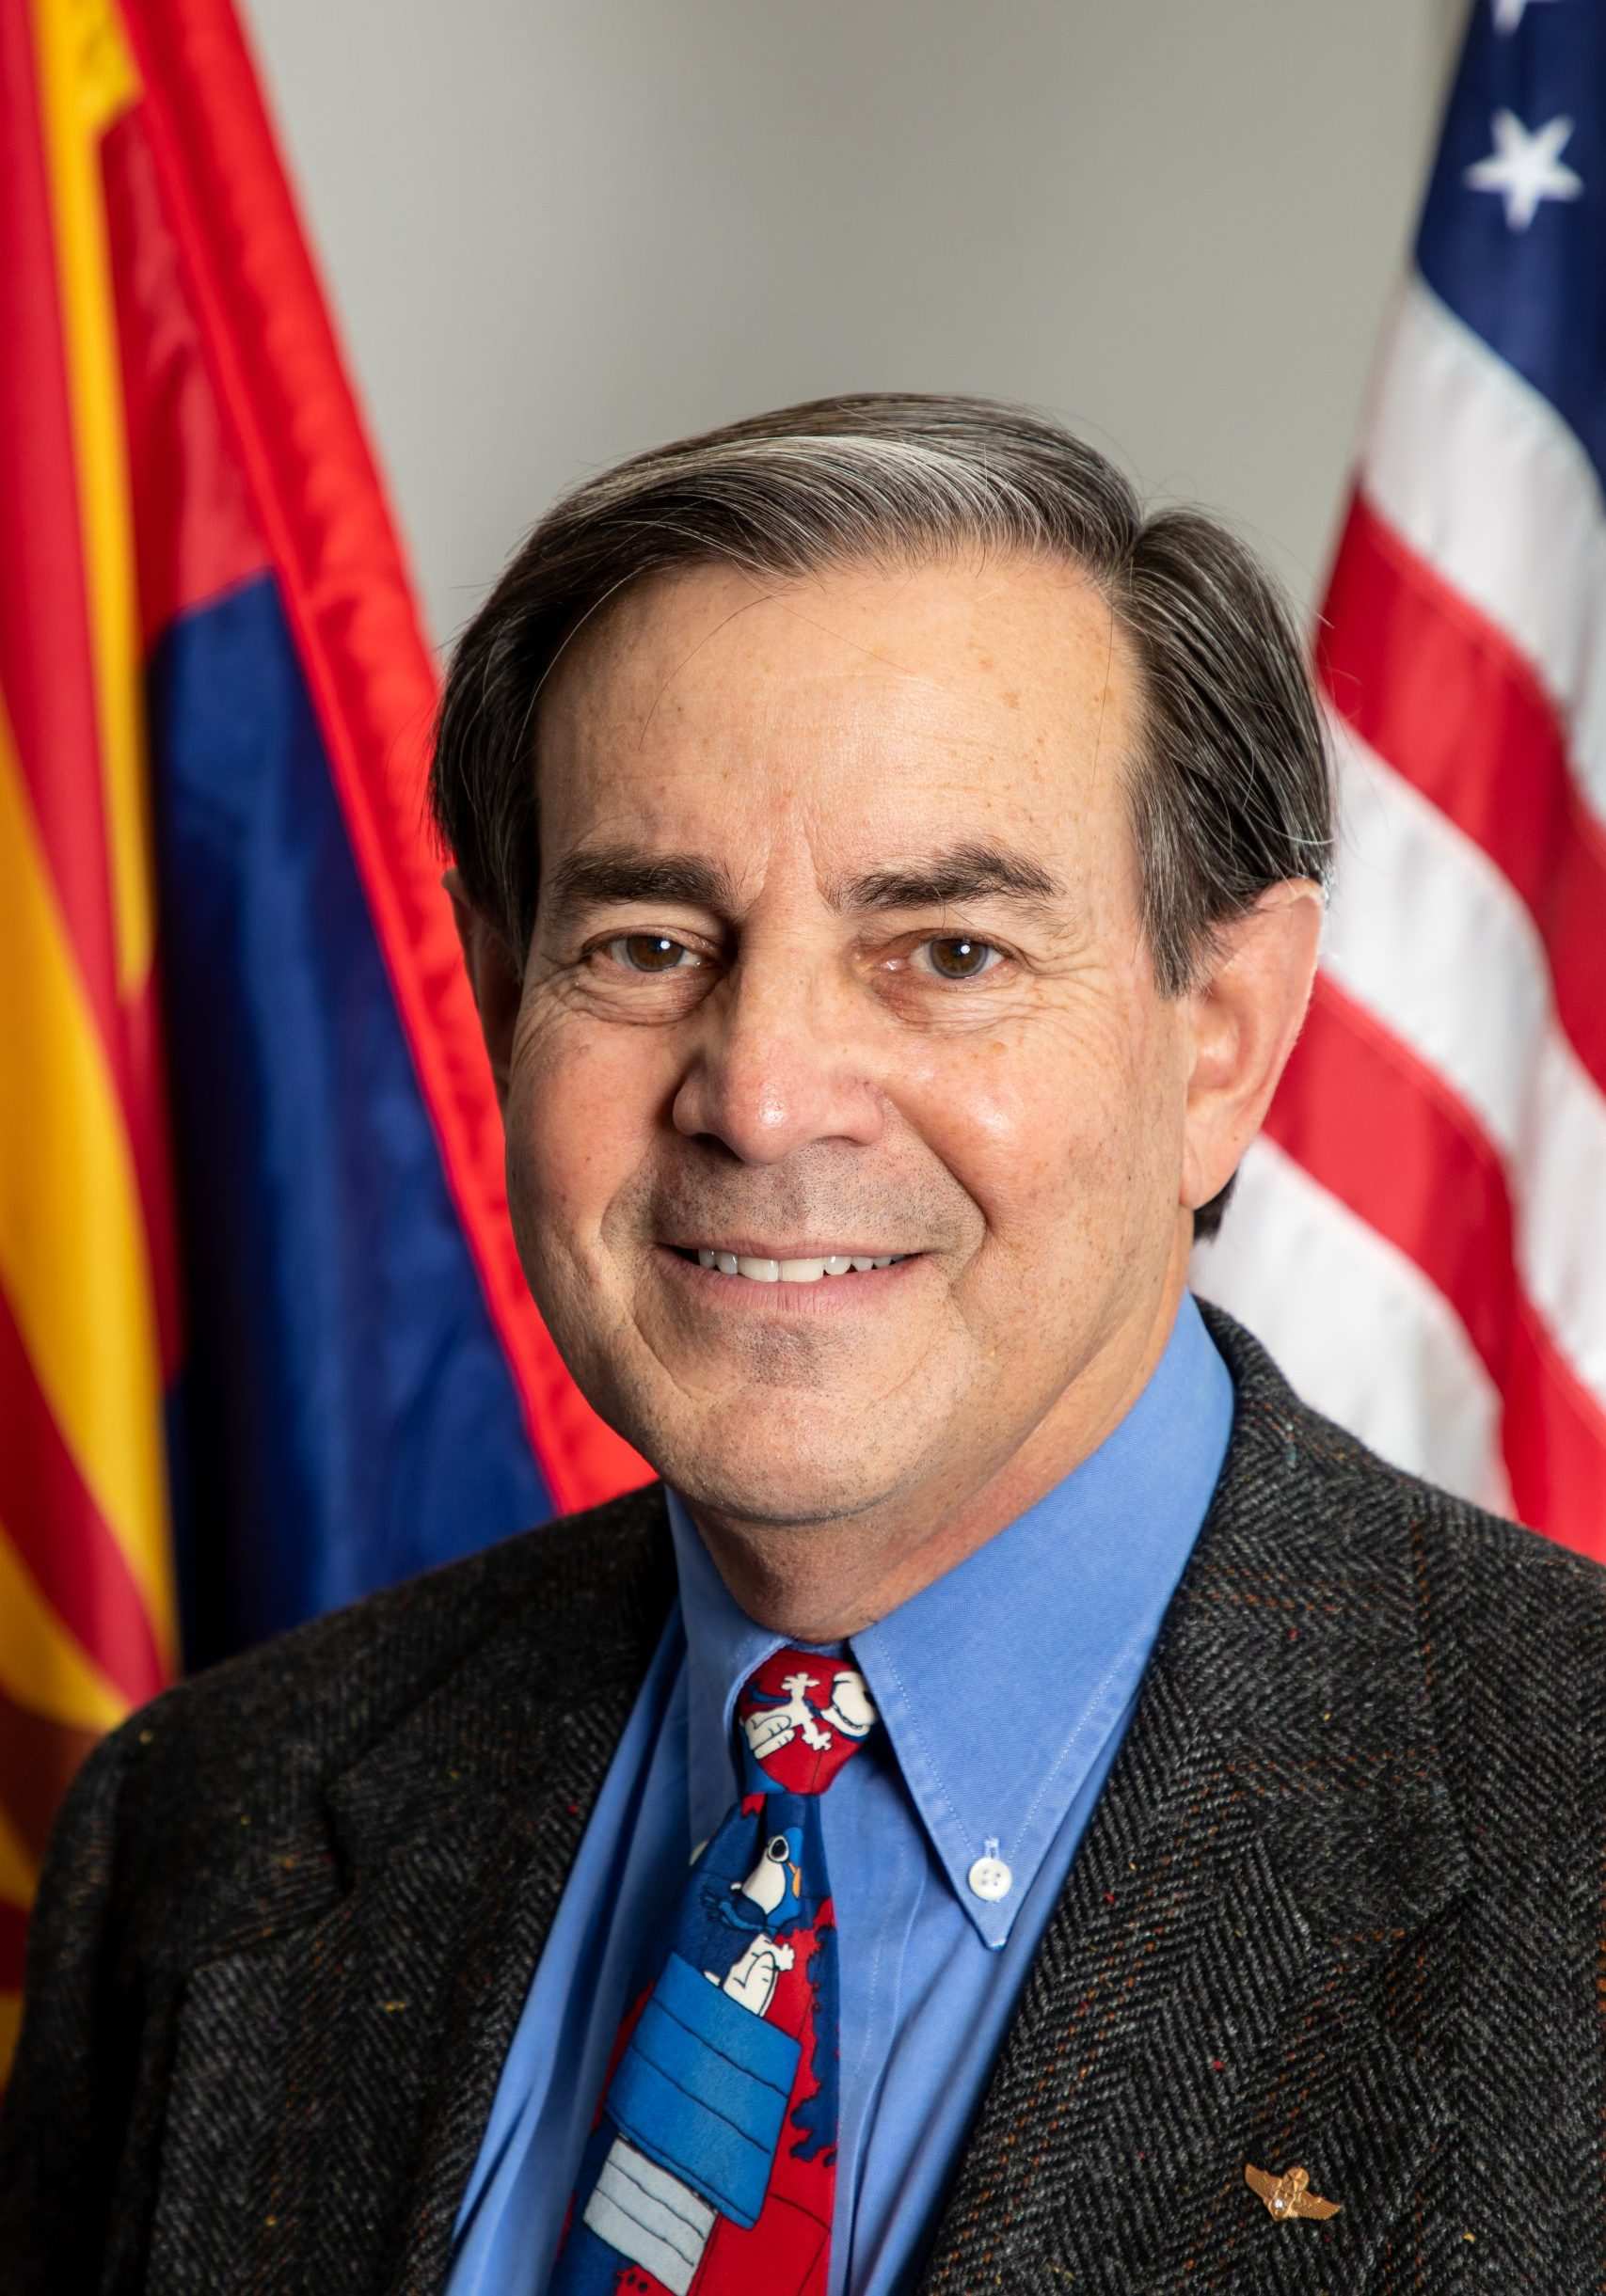 David Sirota